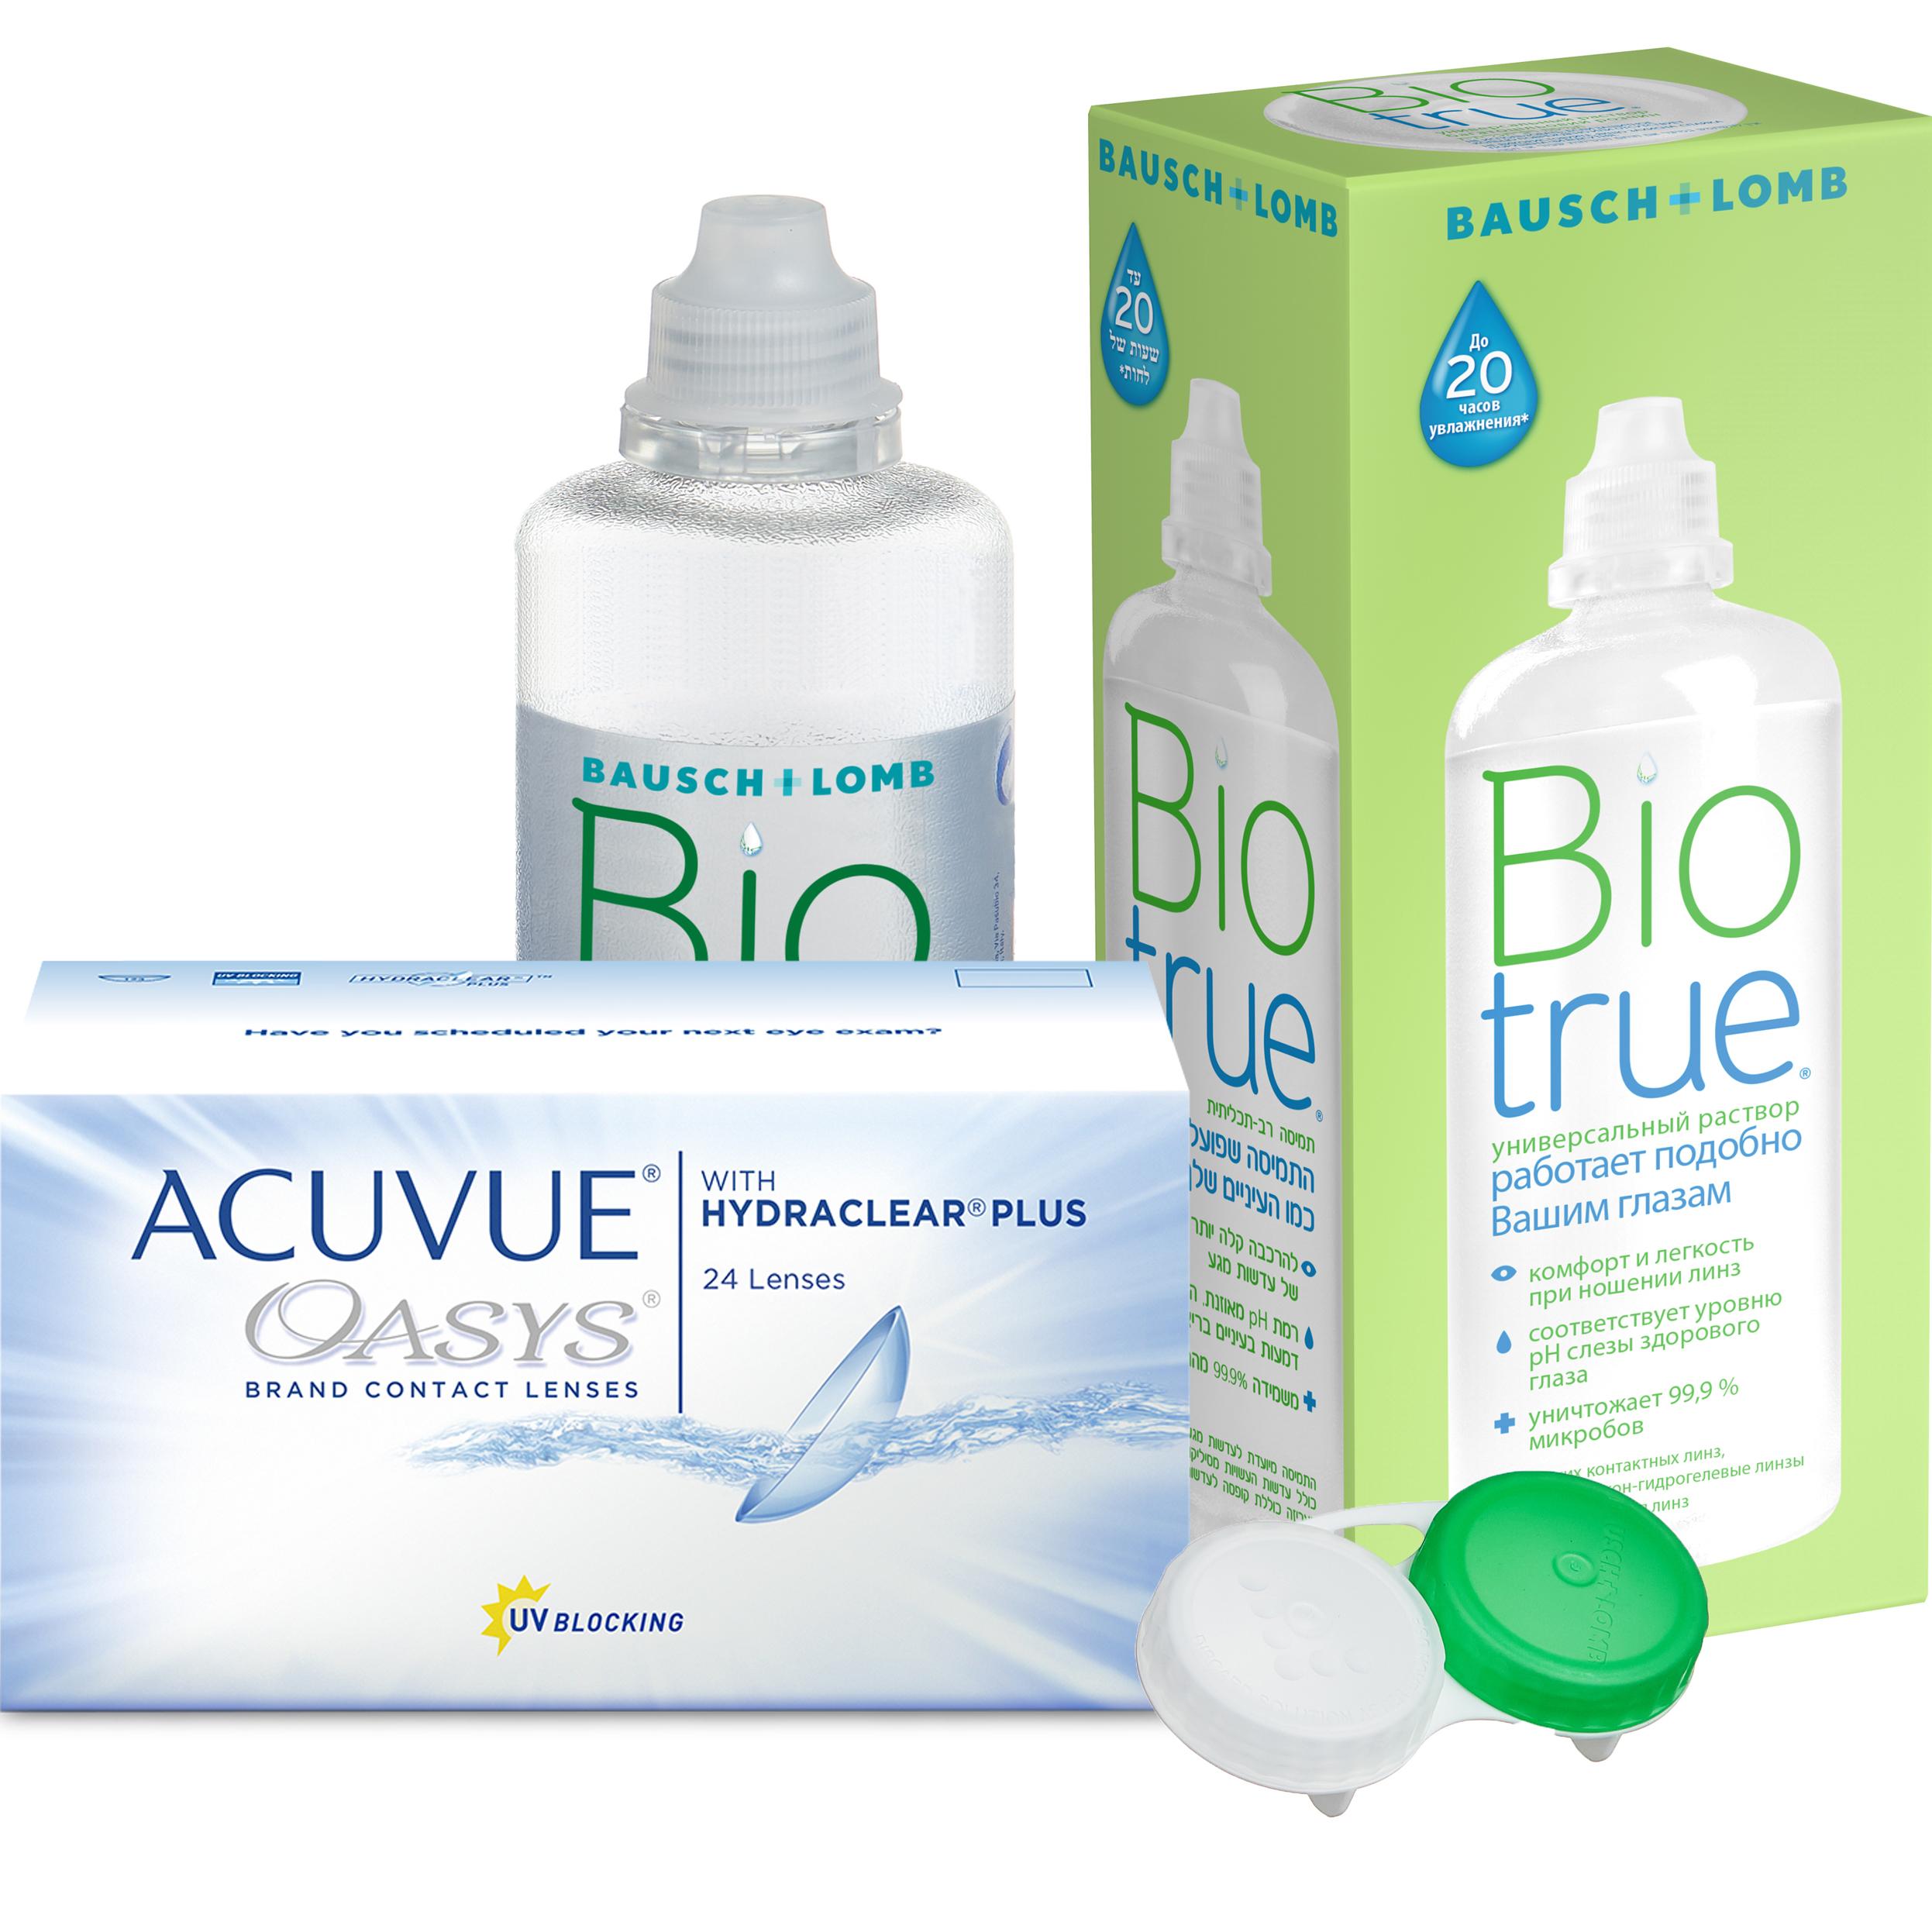 Купить Oasys with Hydraclear Plus 24 линзы + Biotrue, Контактные линзы Acuvue Oasys with Hydraclear Plus 24 линзы R 8.8 -7, 50 + Biotrue 300 мл